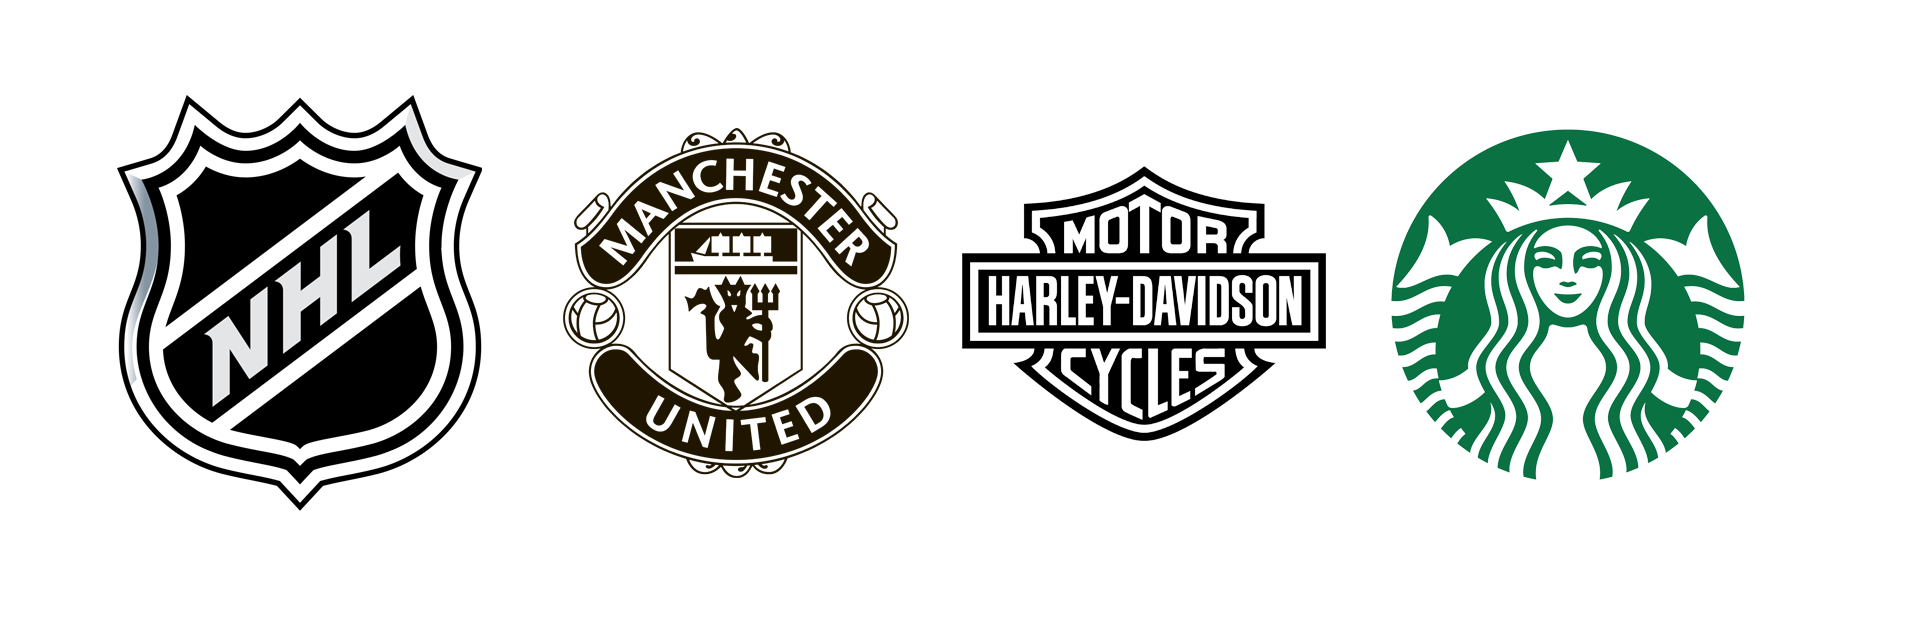 Emblem Logo, NHL, Manchester United, Harley-Davidson, Starbucks